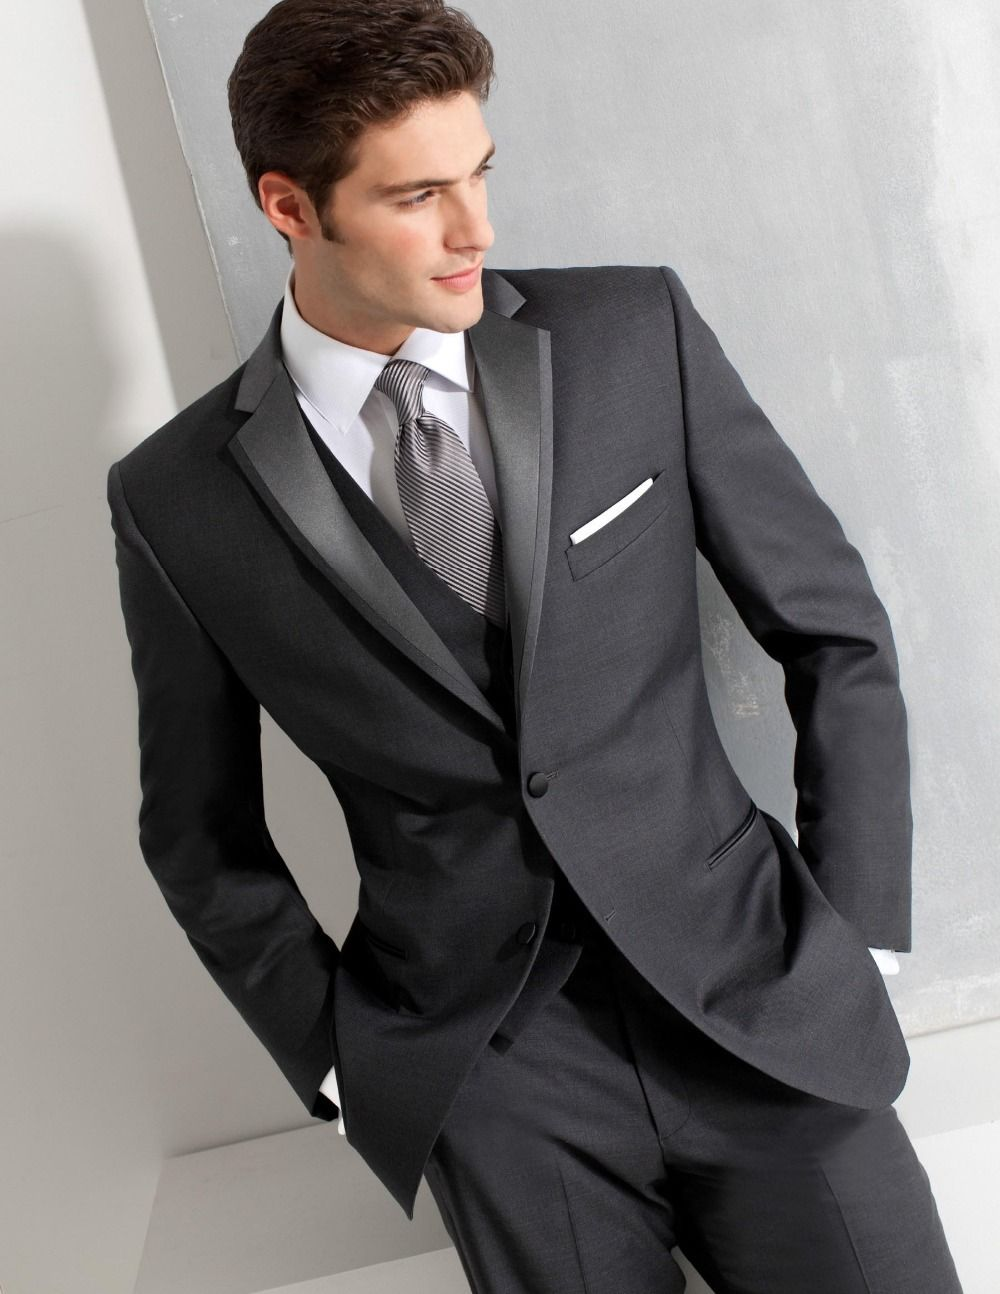 Dark Gray Suits Wedding Two buttons groom tuxedos dark | CHESTI DE ...